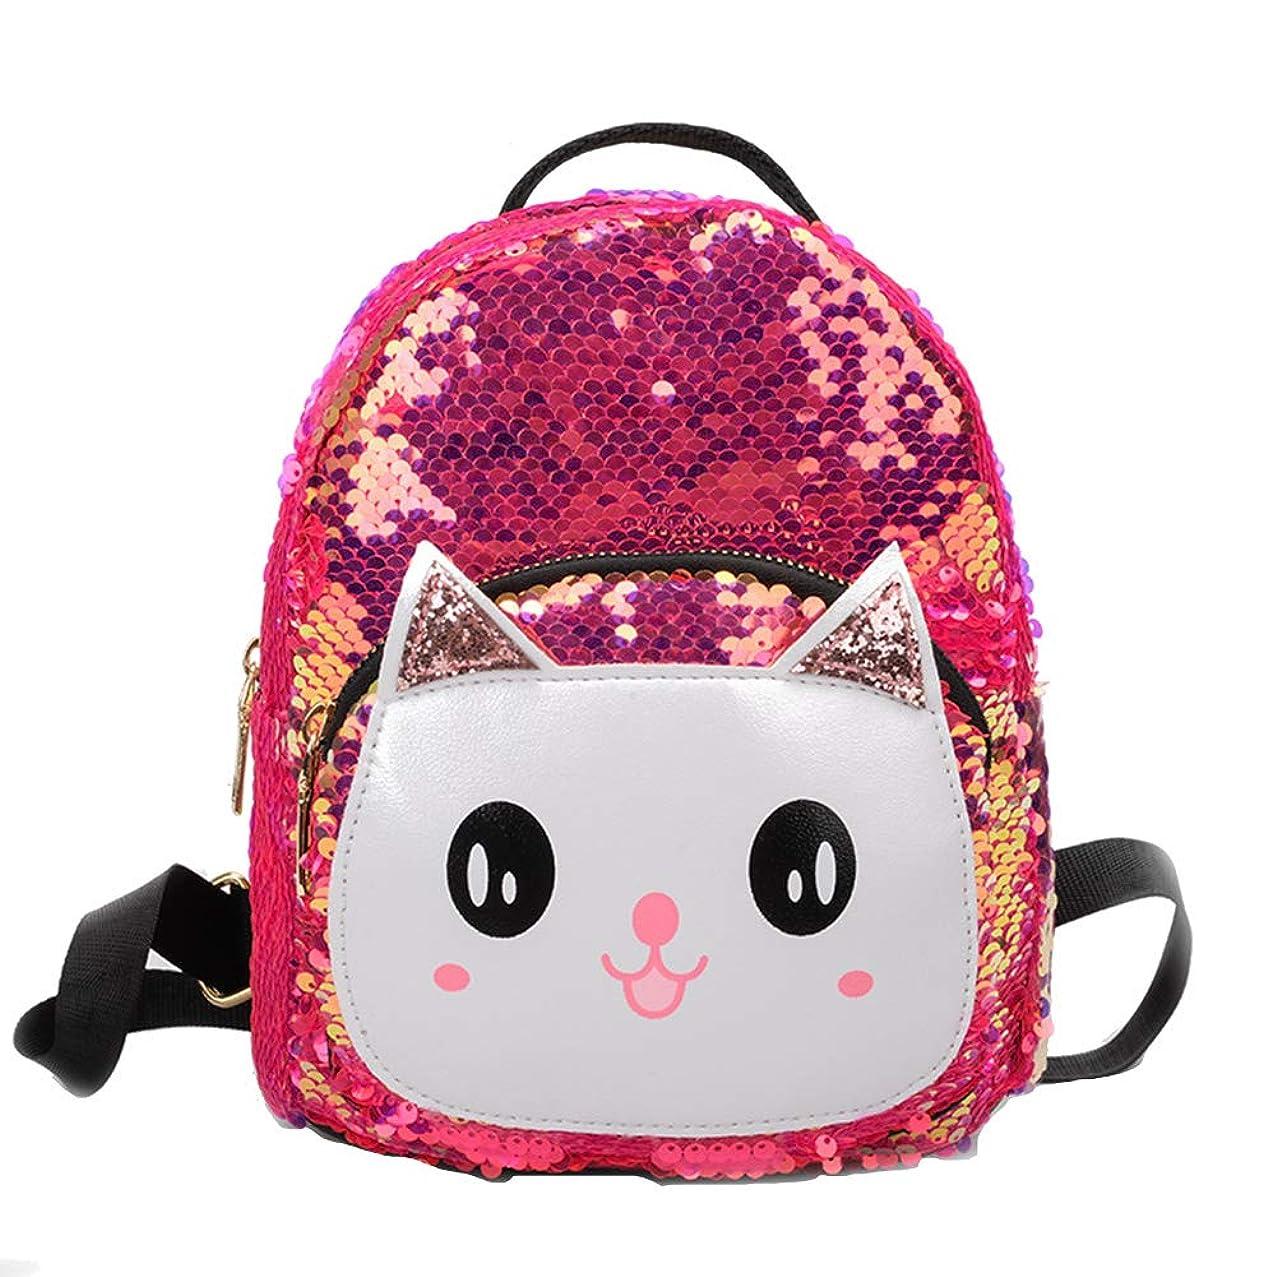 Backpacks&Travel School Children Girl Cartoon Cat Sequined Backpack Small Shoulder Bag &for Daily School Gift